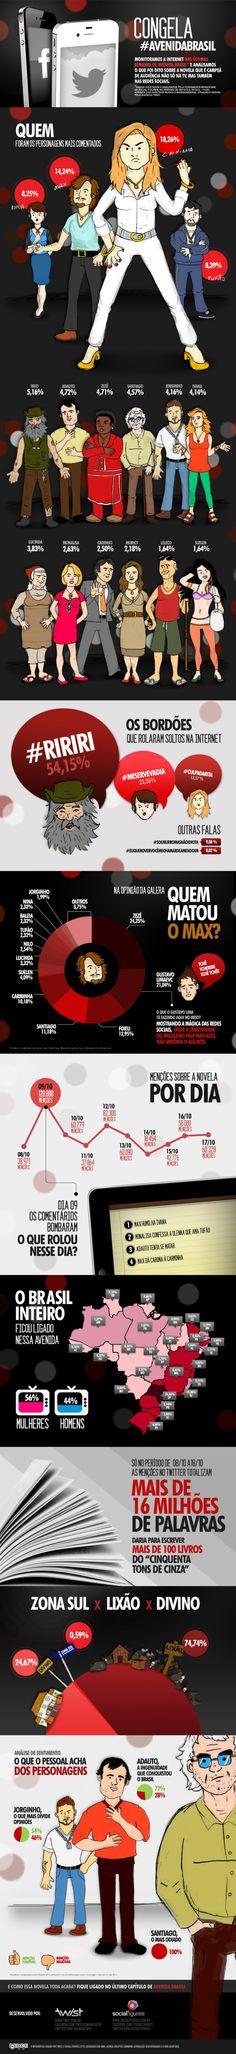 #AvenidaBrasil em um infográfico.